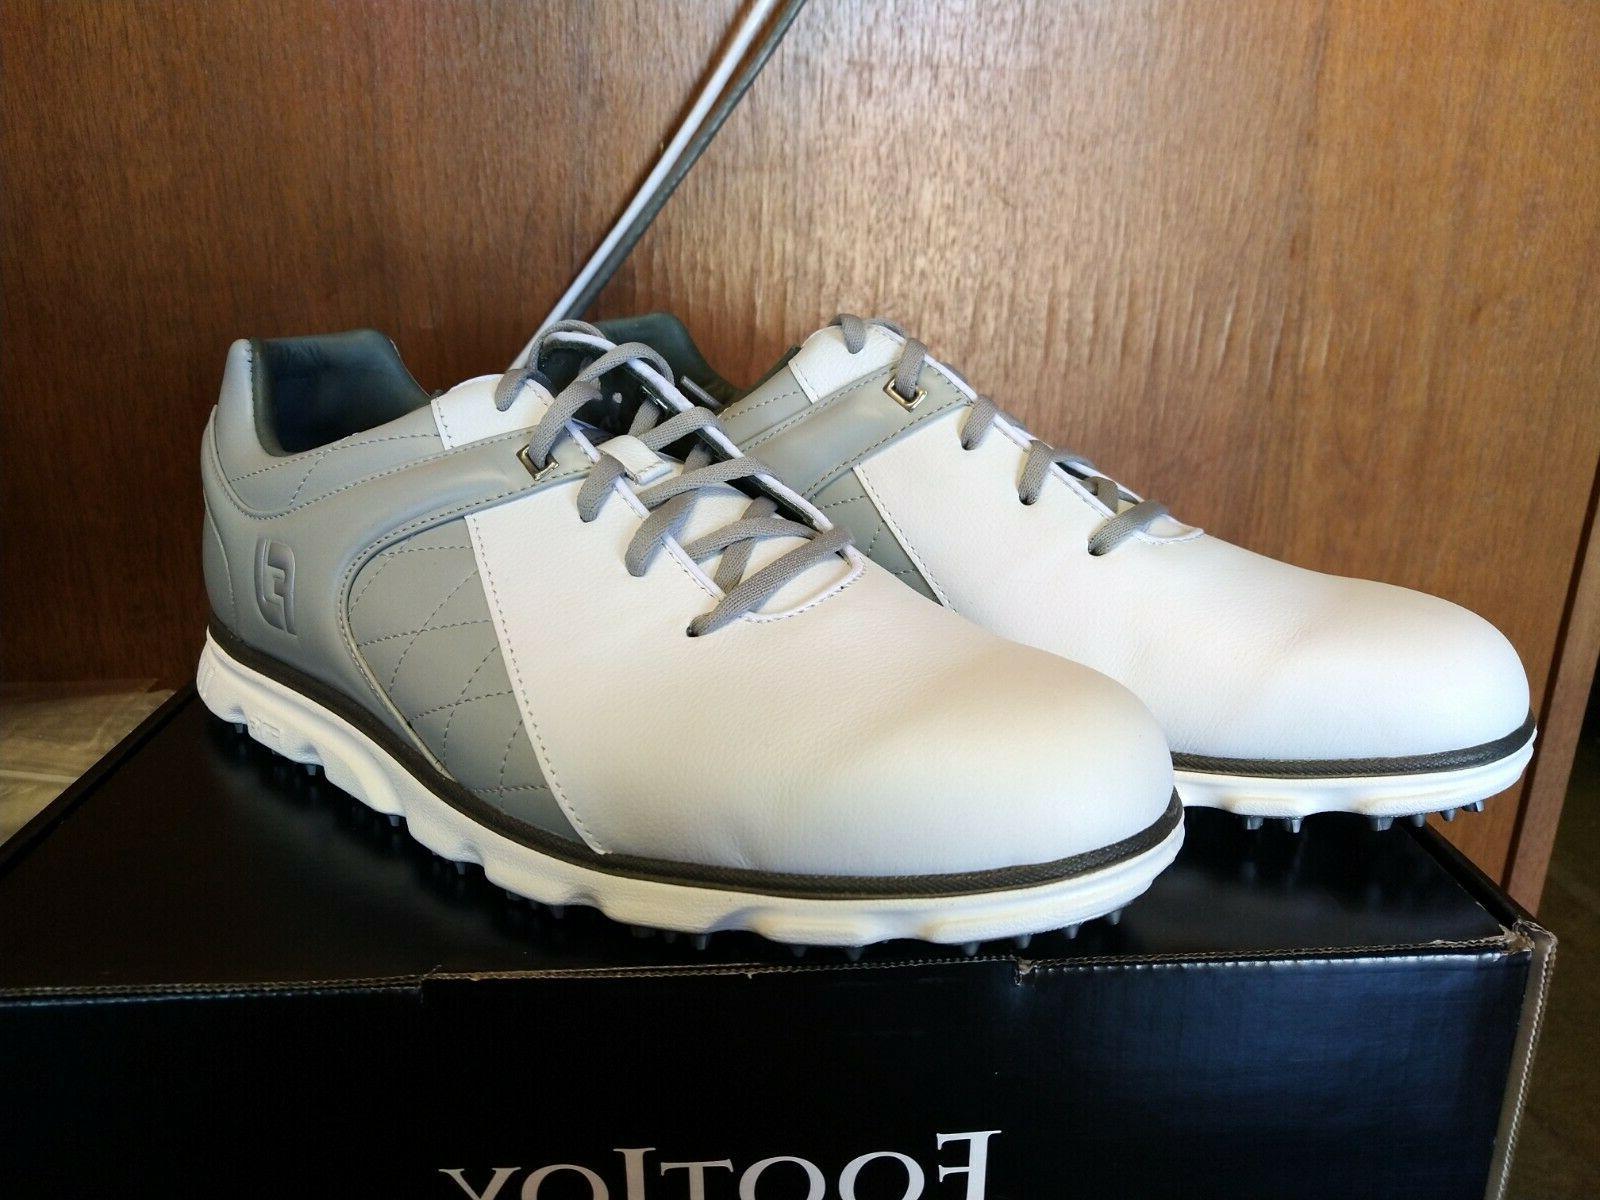 pro sl boa golf shoes 53250 gray